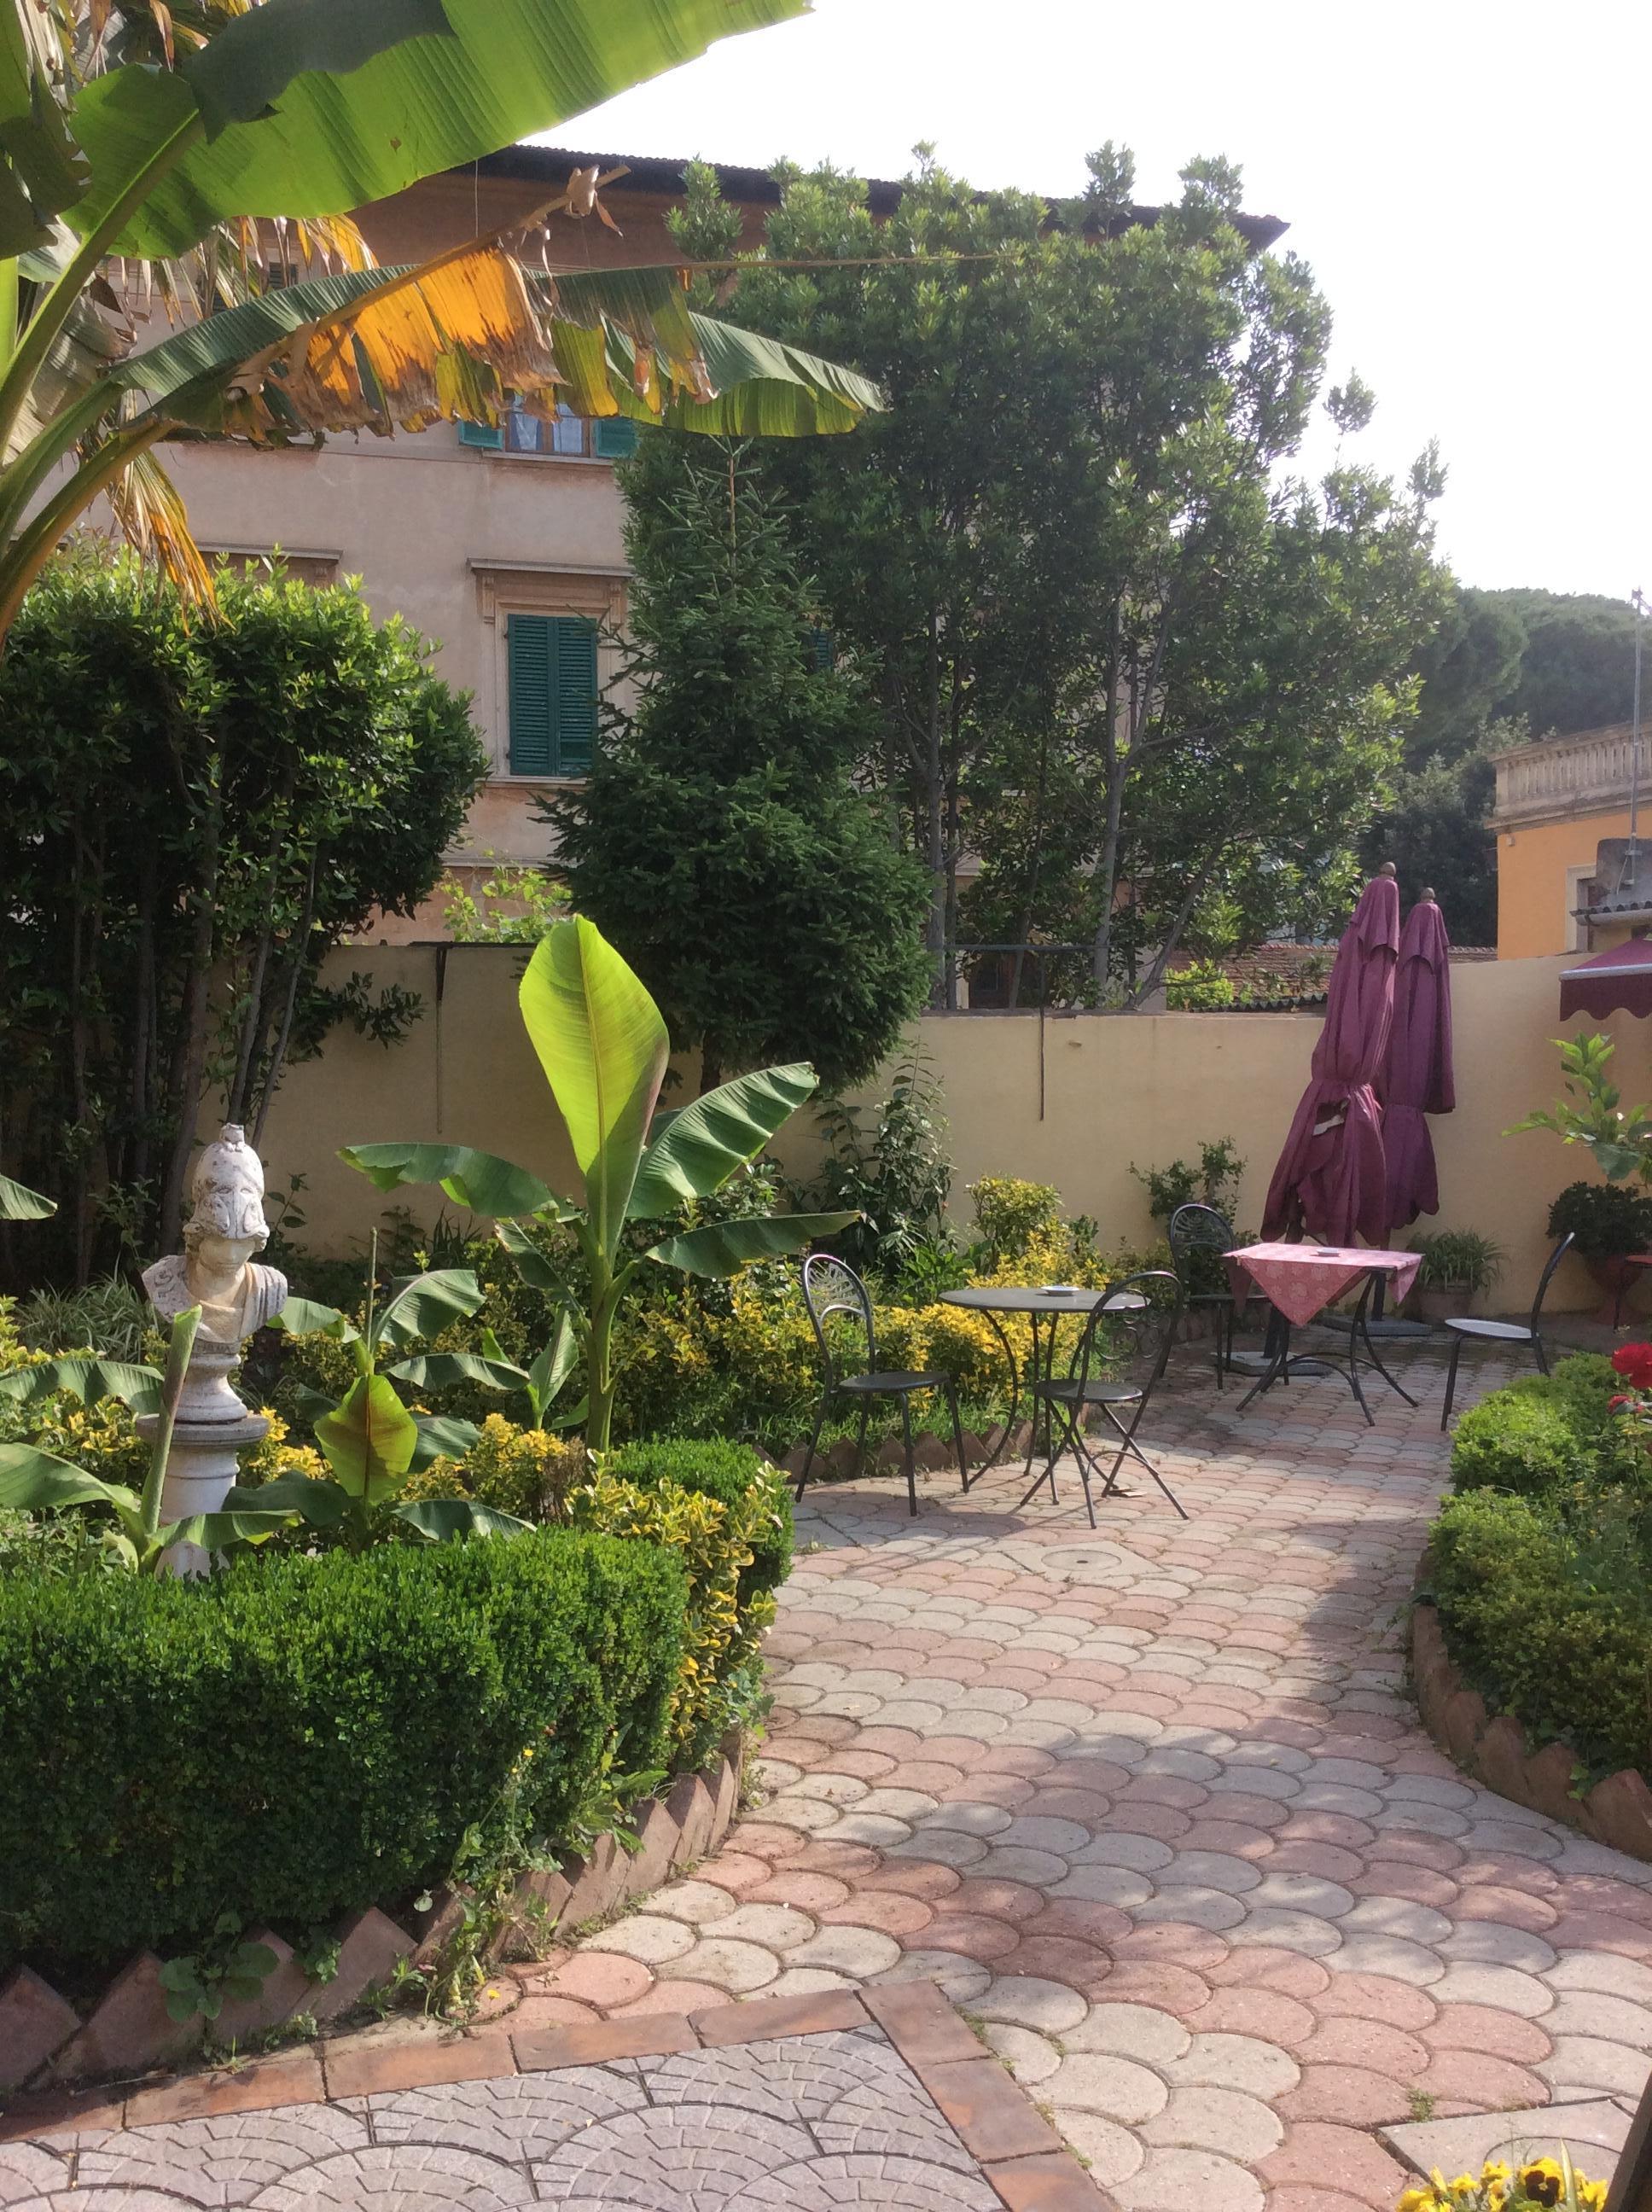 Hotel Soggiorno Athena (Pisa, ITA): Great Rates at Expedia.ie